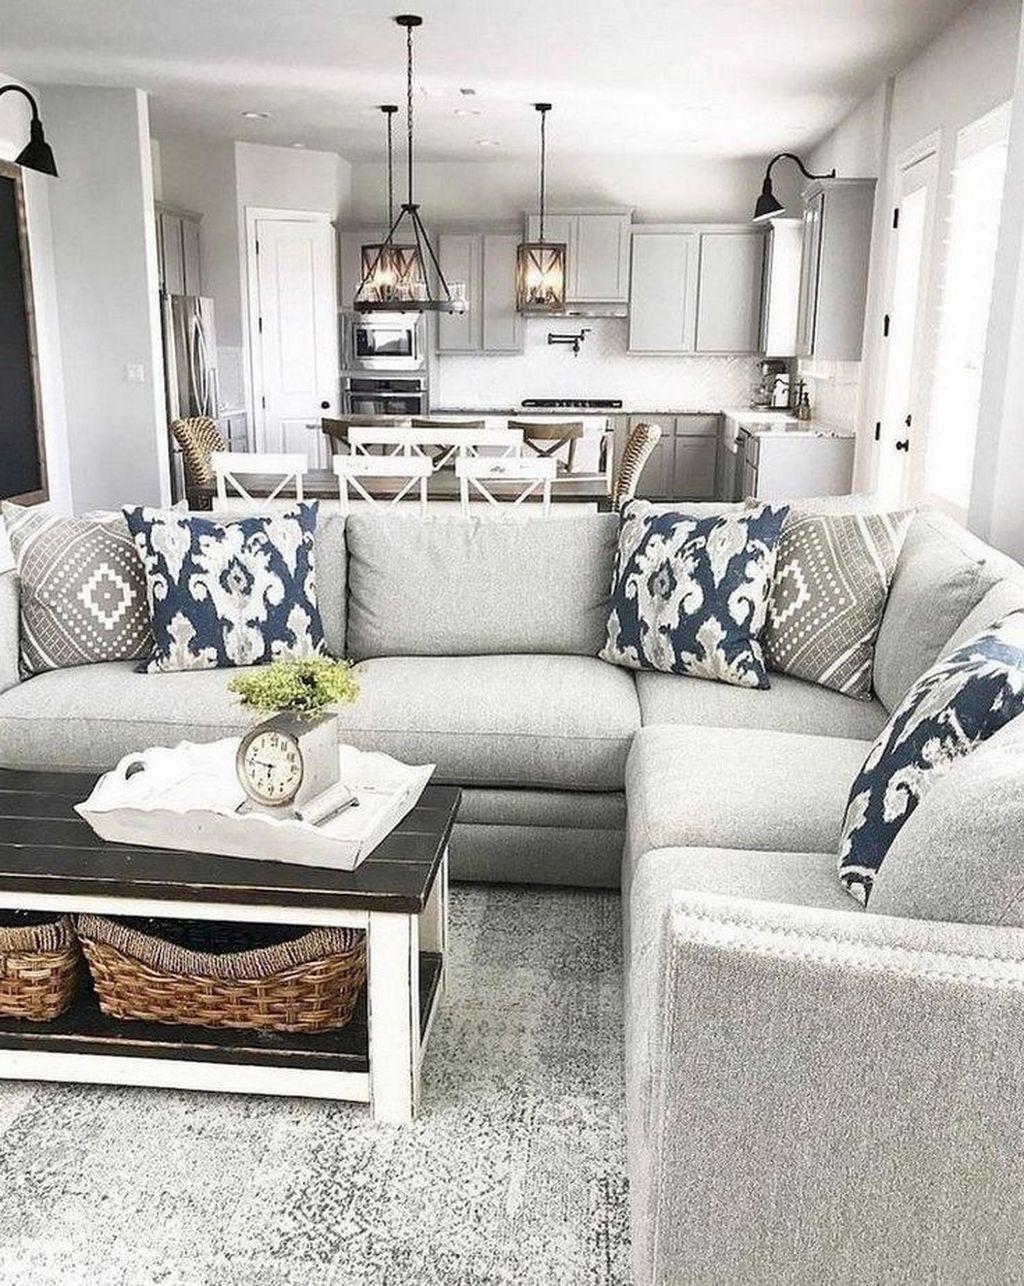 Rustic Farmhouse Furniture Design Ideas For Living Room 08